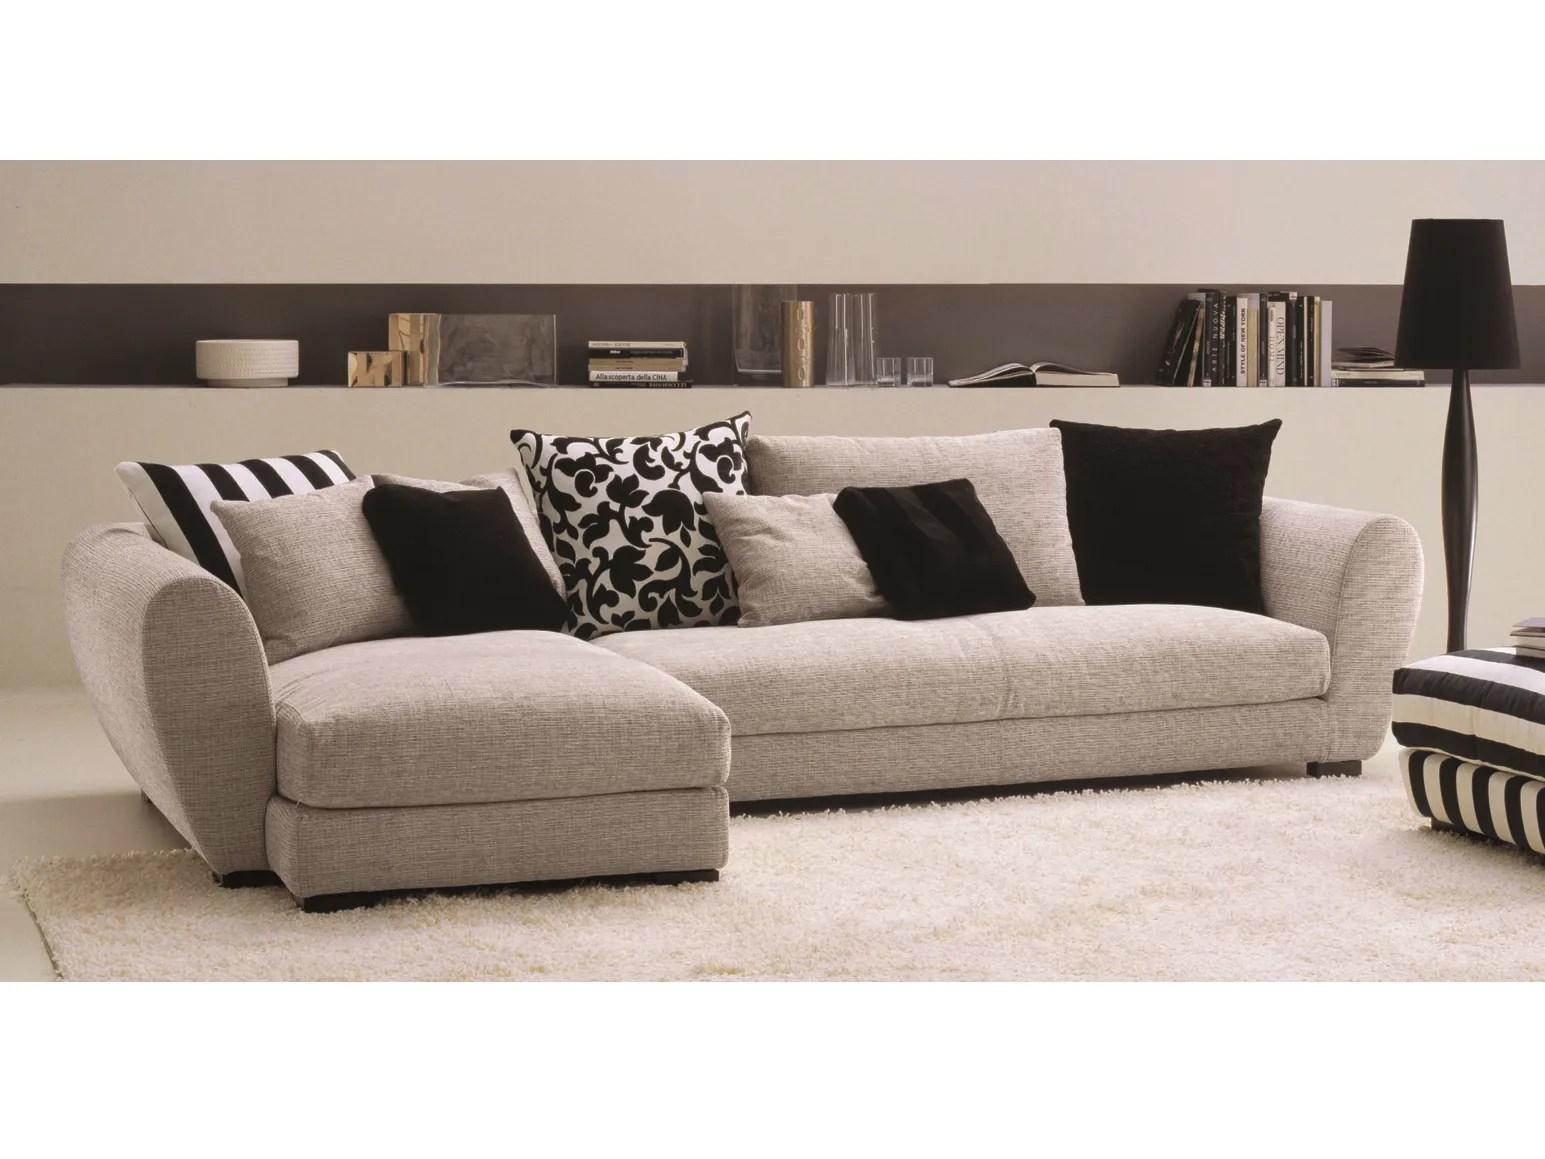 corner sofa cover design wooden for sale singapore taylor by bontempi casa carlo bimbi